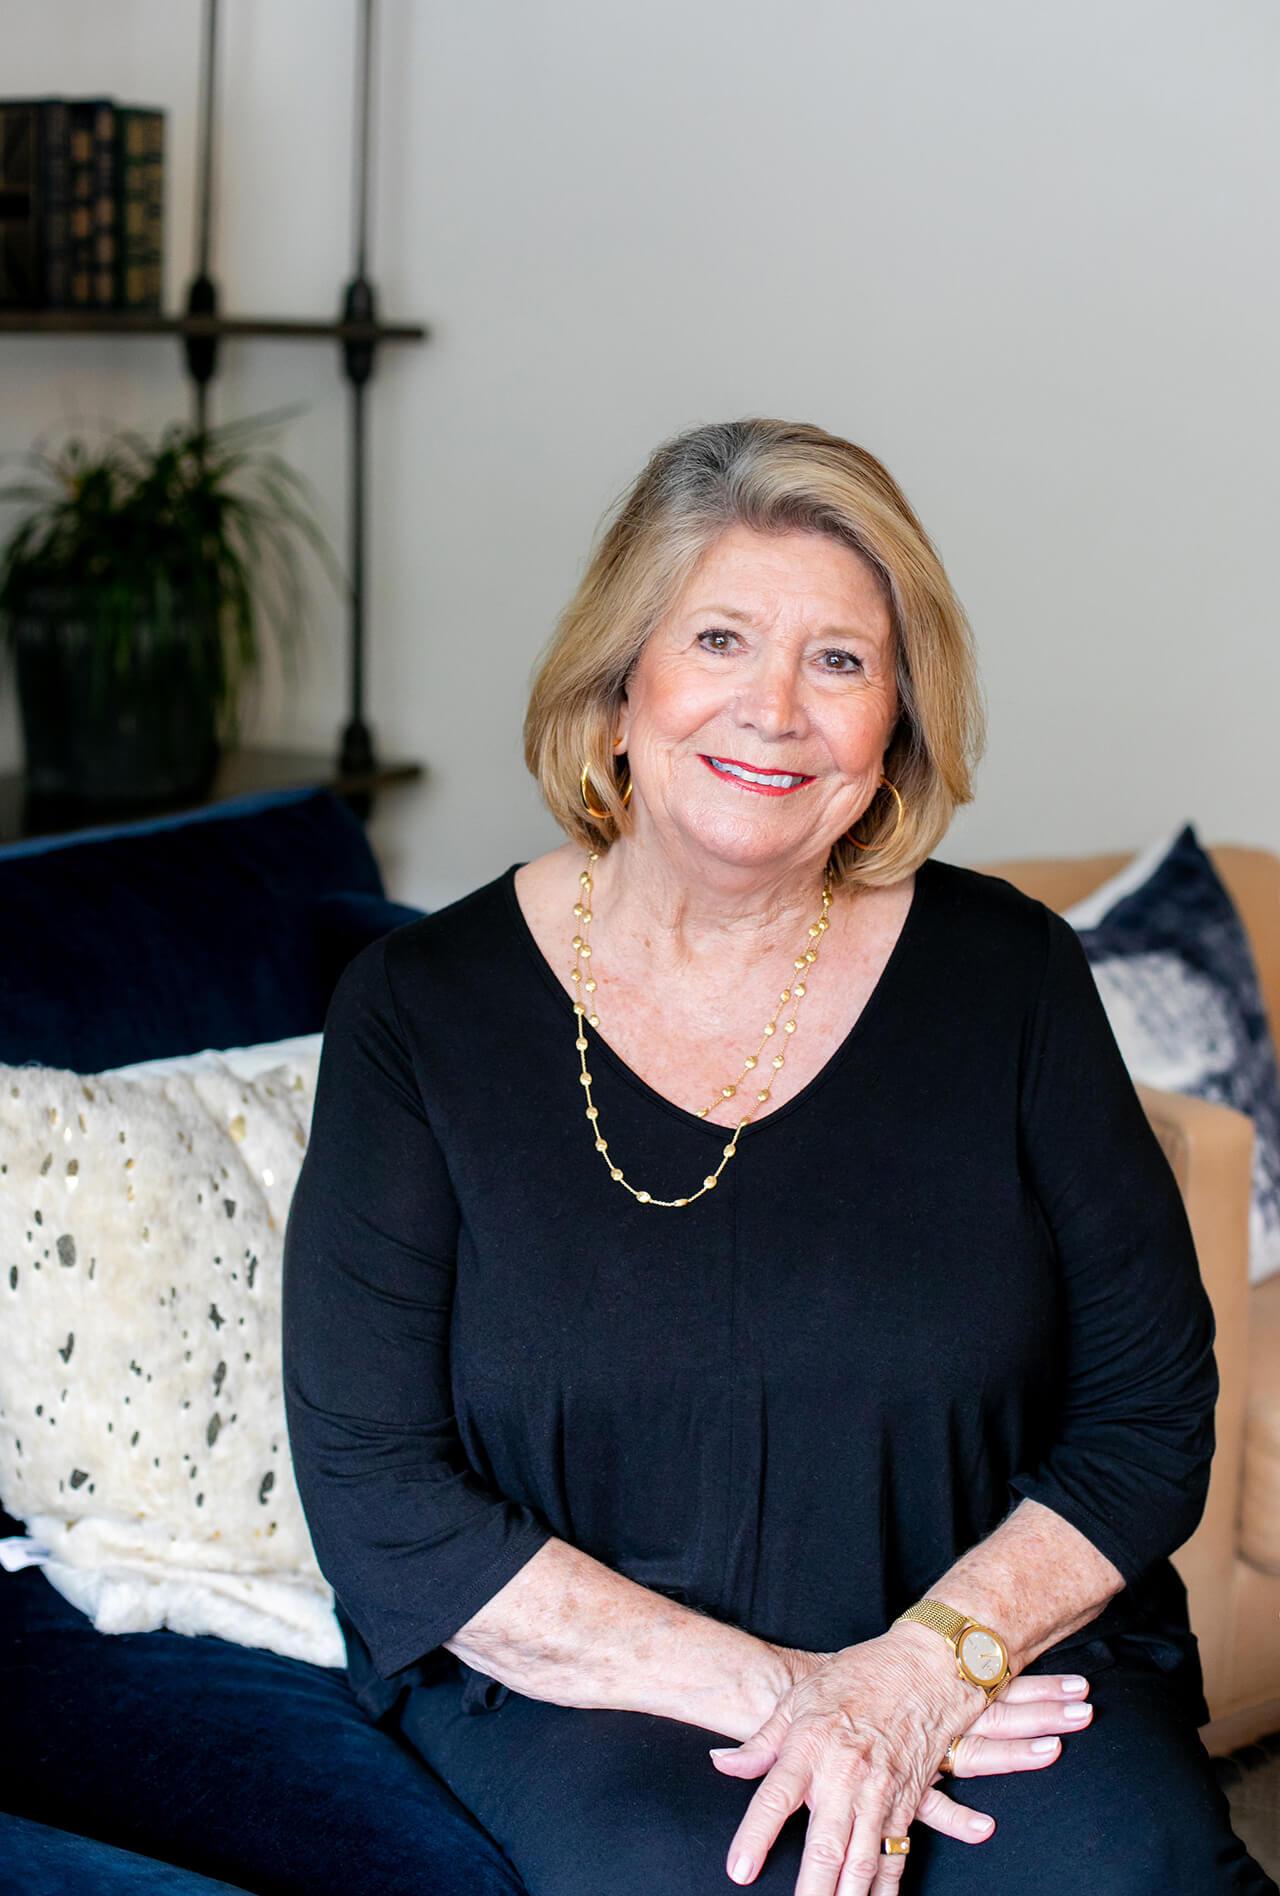 Pamela Stockton